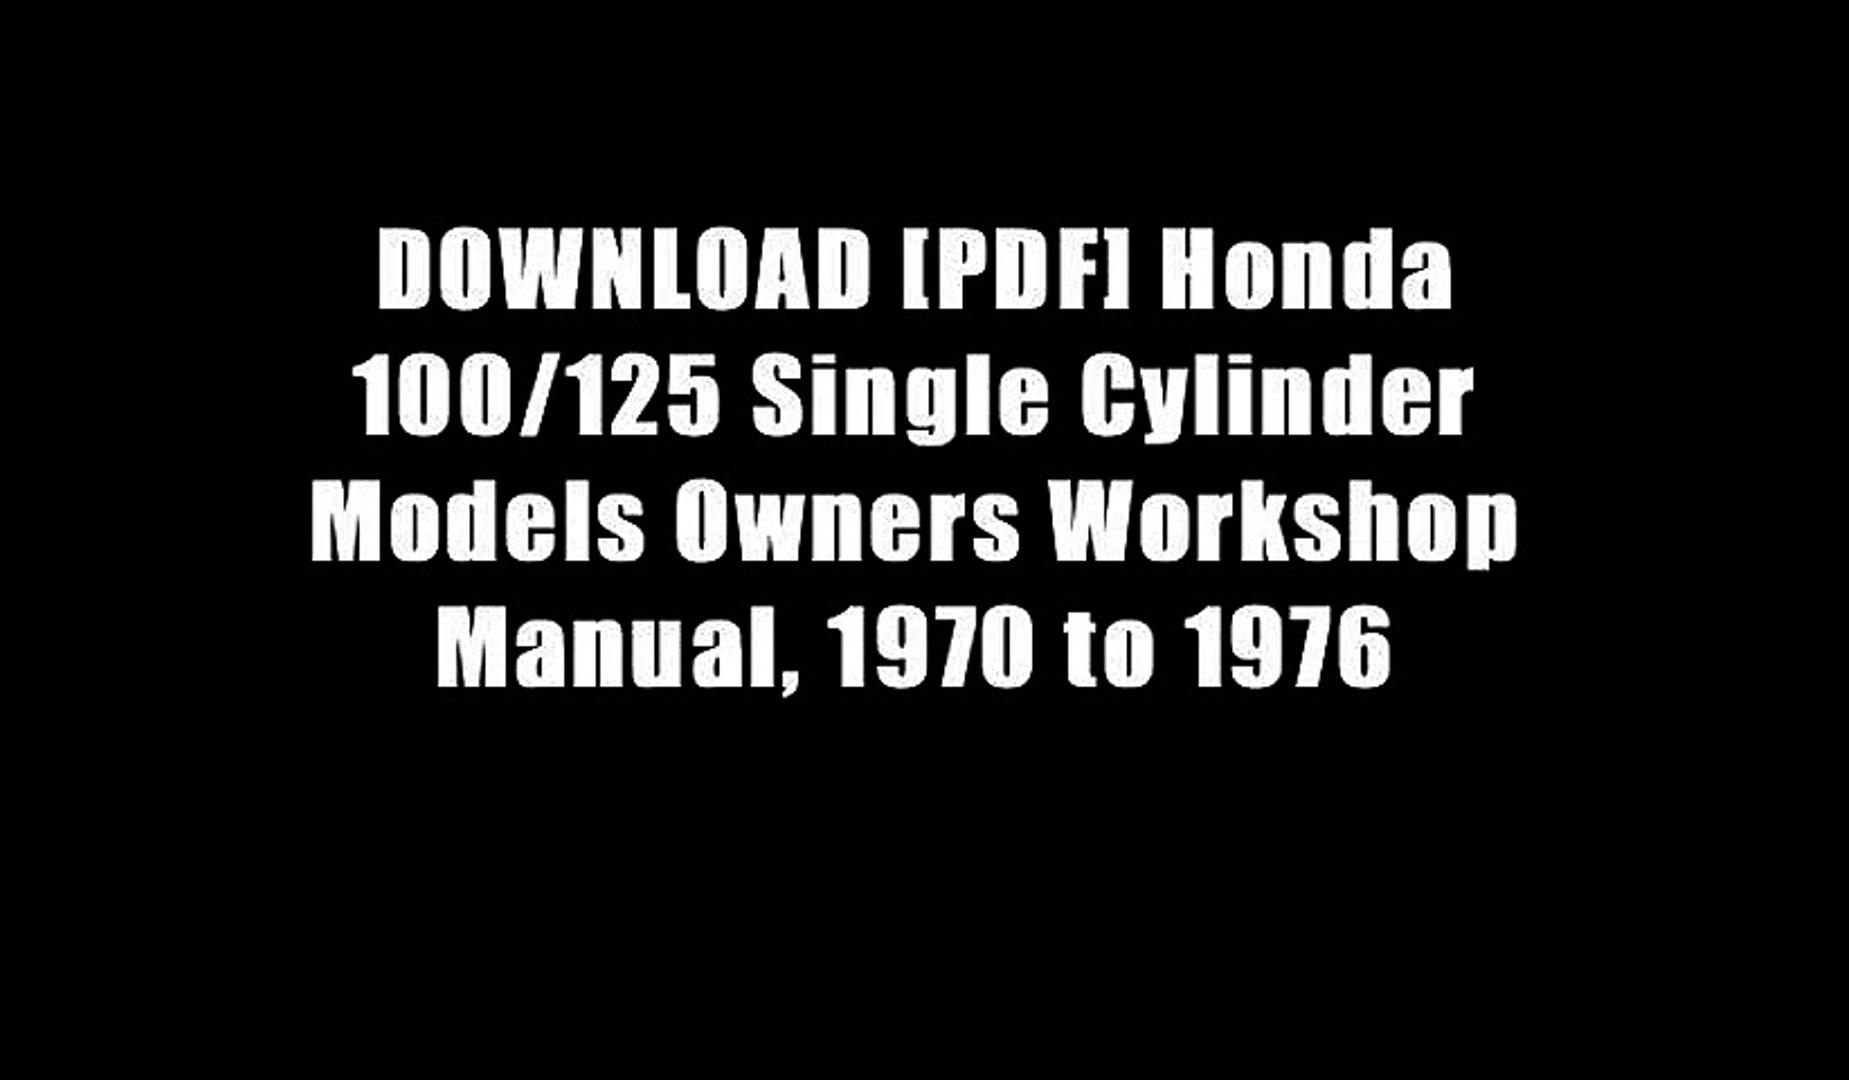 Haynes Workshop Manual Porsche 914 1969-1976 Service /& Repair 4 Cylinder Models